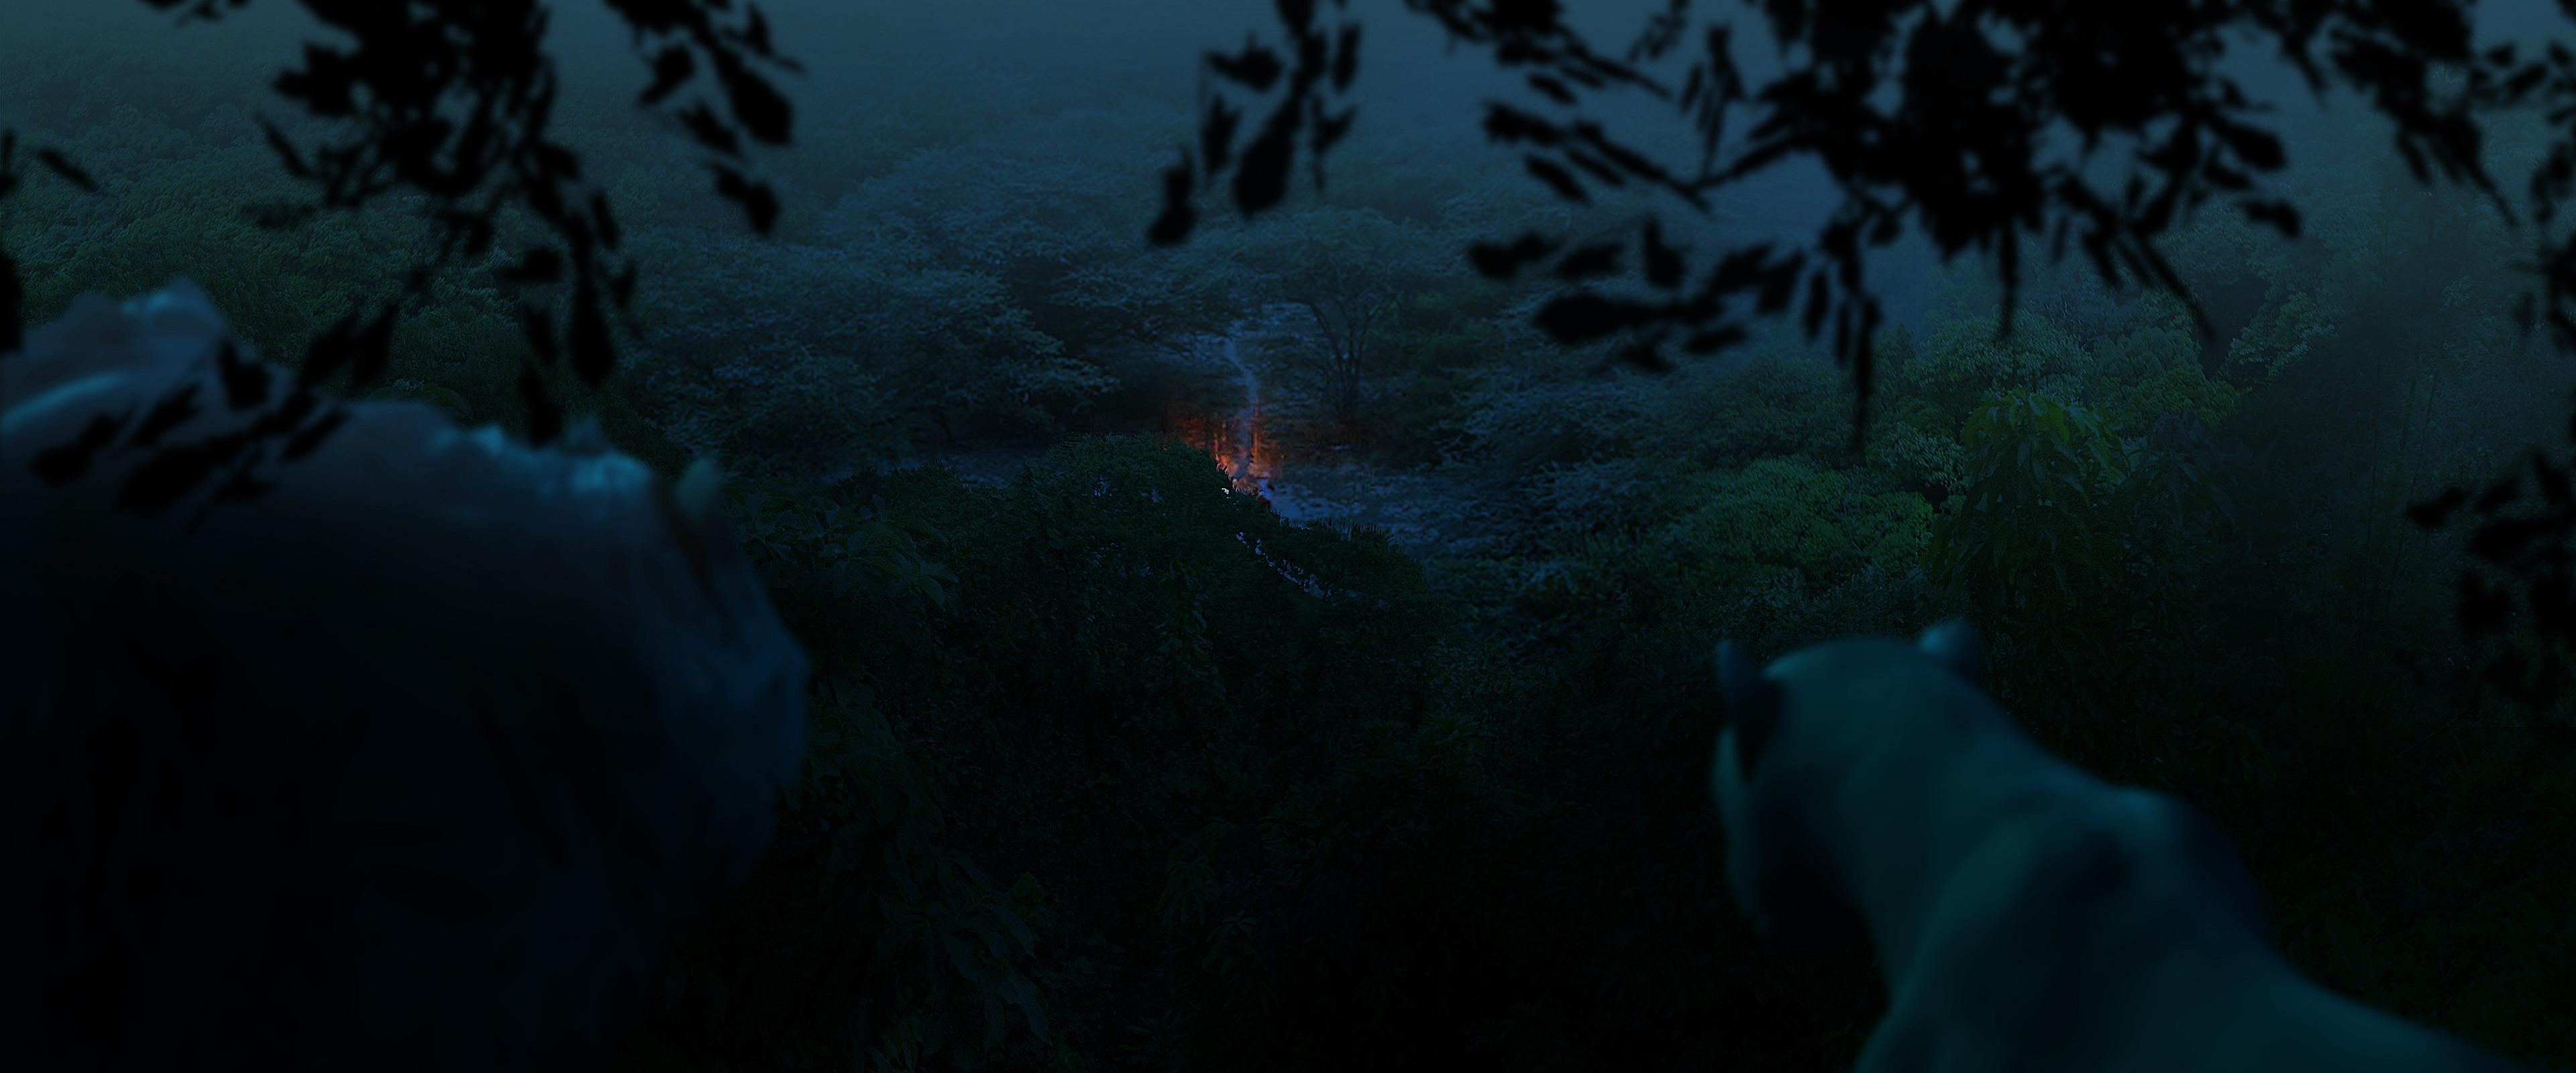 Le Livre de la Jungle [Disney - 2016] - Page 15 Andrew-leung-foresttorchrun-overlook-al-v01-140815